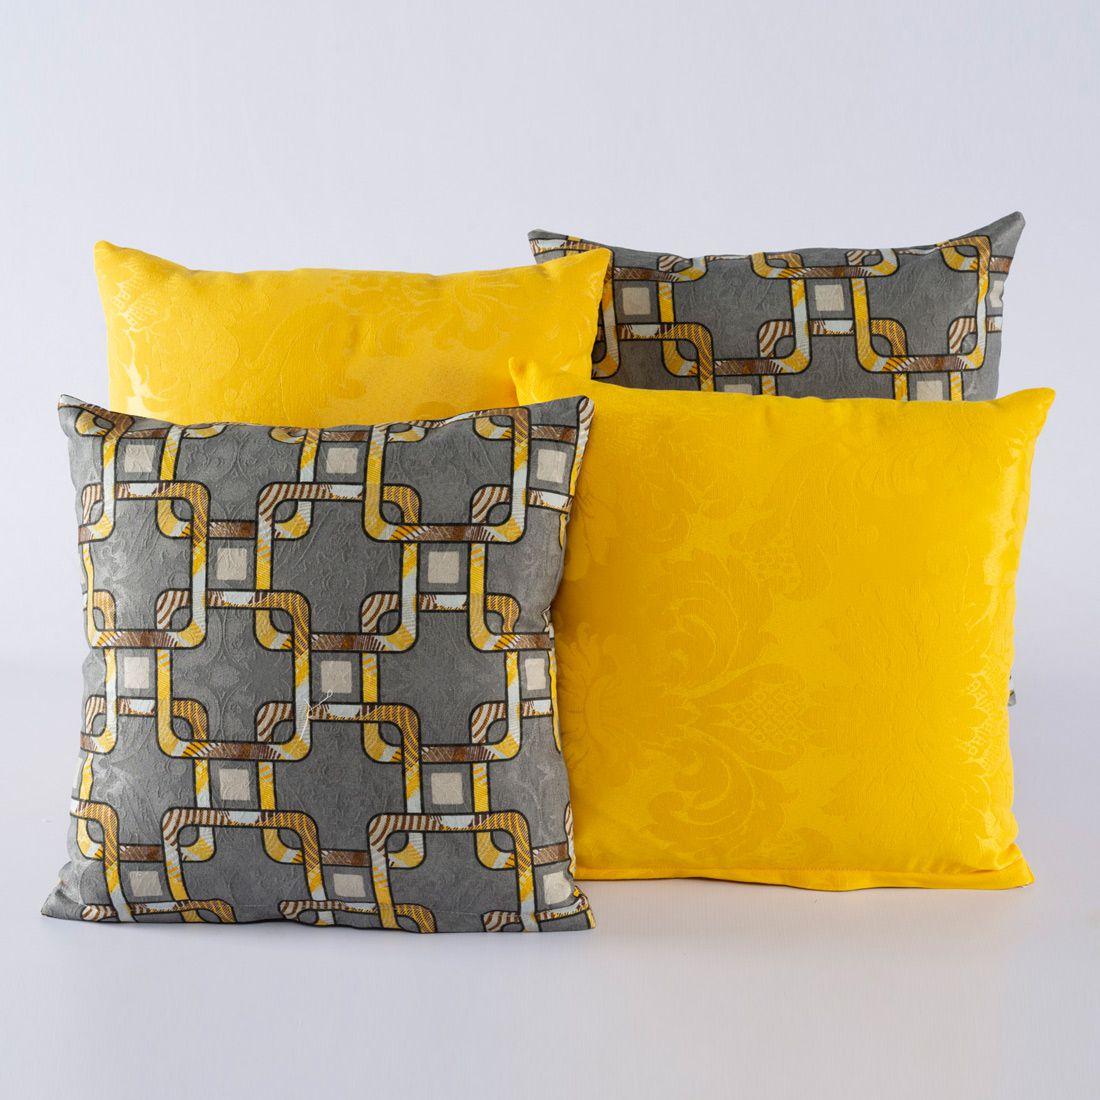 Kit c/ 4 Almofadas Cheias Decorativas Geo Cinza/Amarelo